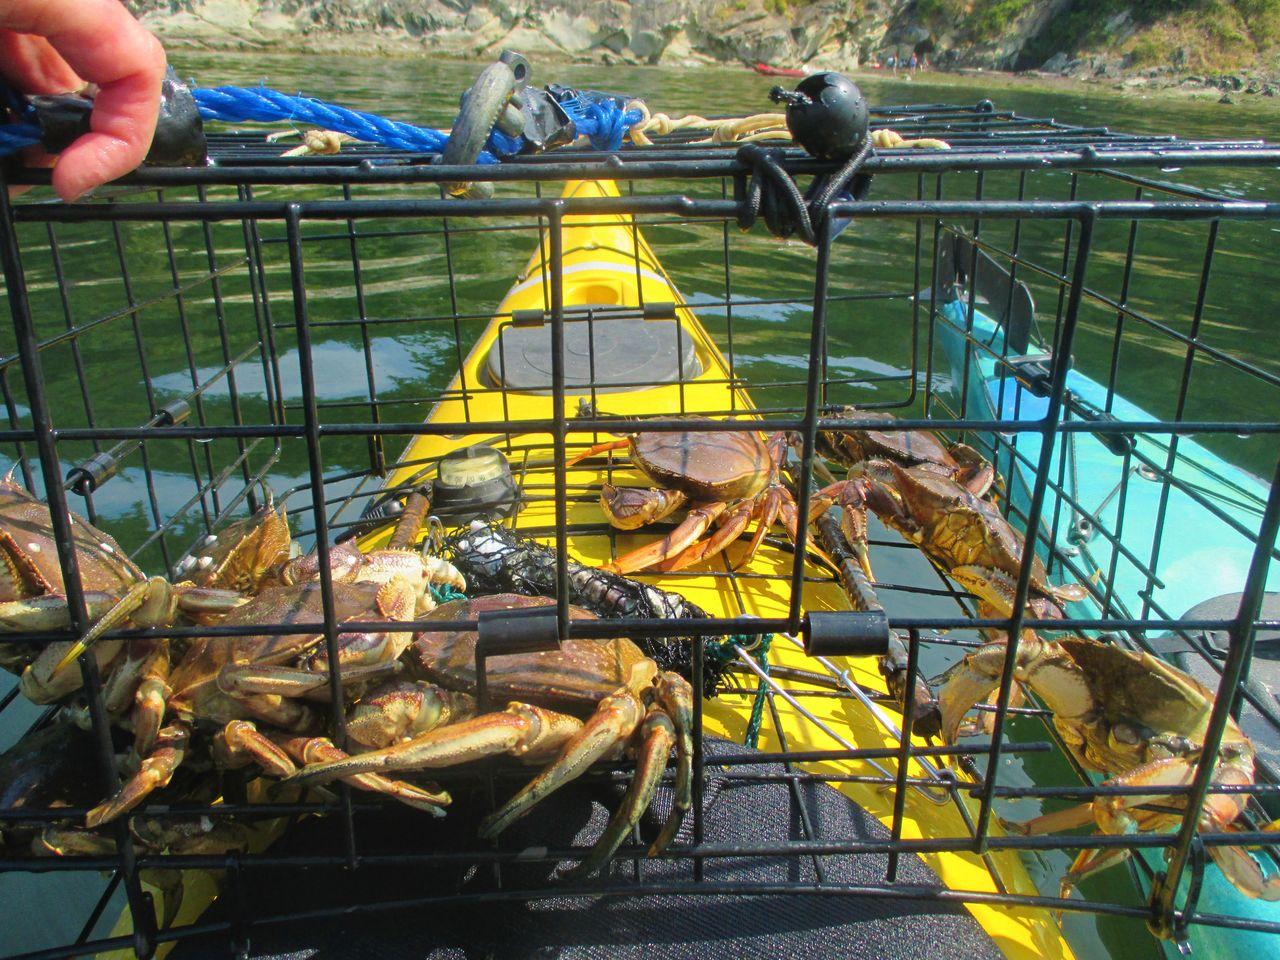 Bellingham, Washington Catching Crabs Crabbing Dungeness Crab Kayak Crabbing Kayak Fishing Leisure Activity Lifestyles Outdoors Unrecognizable Person